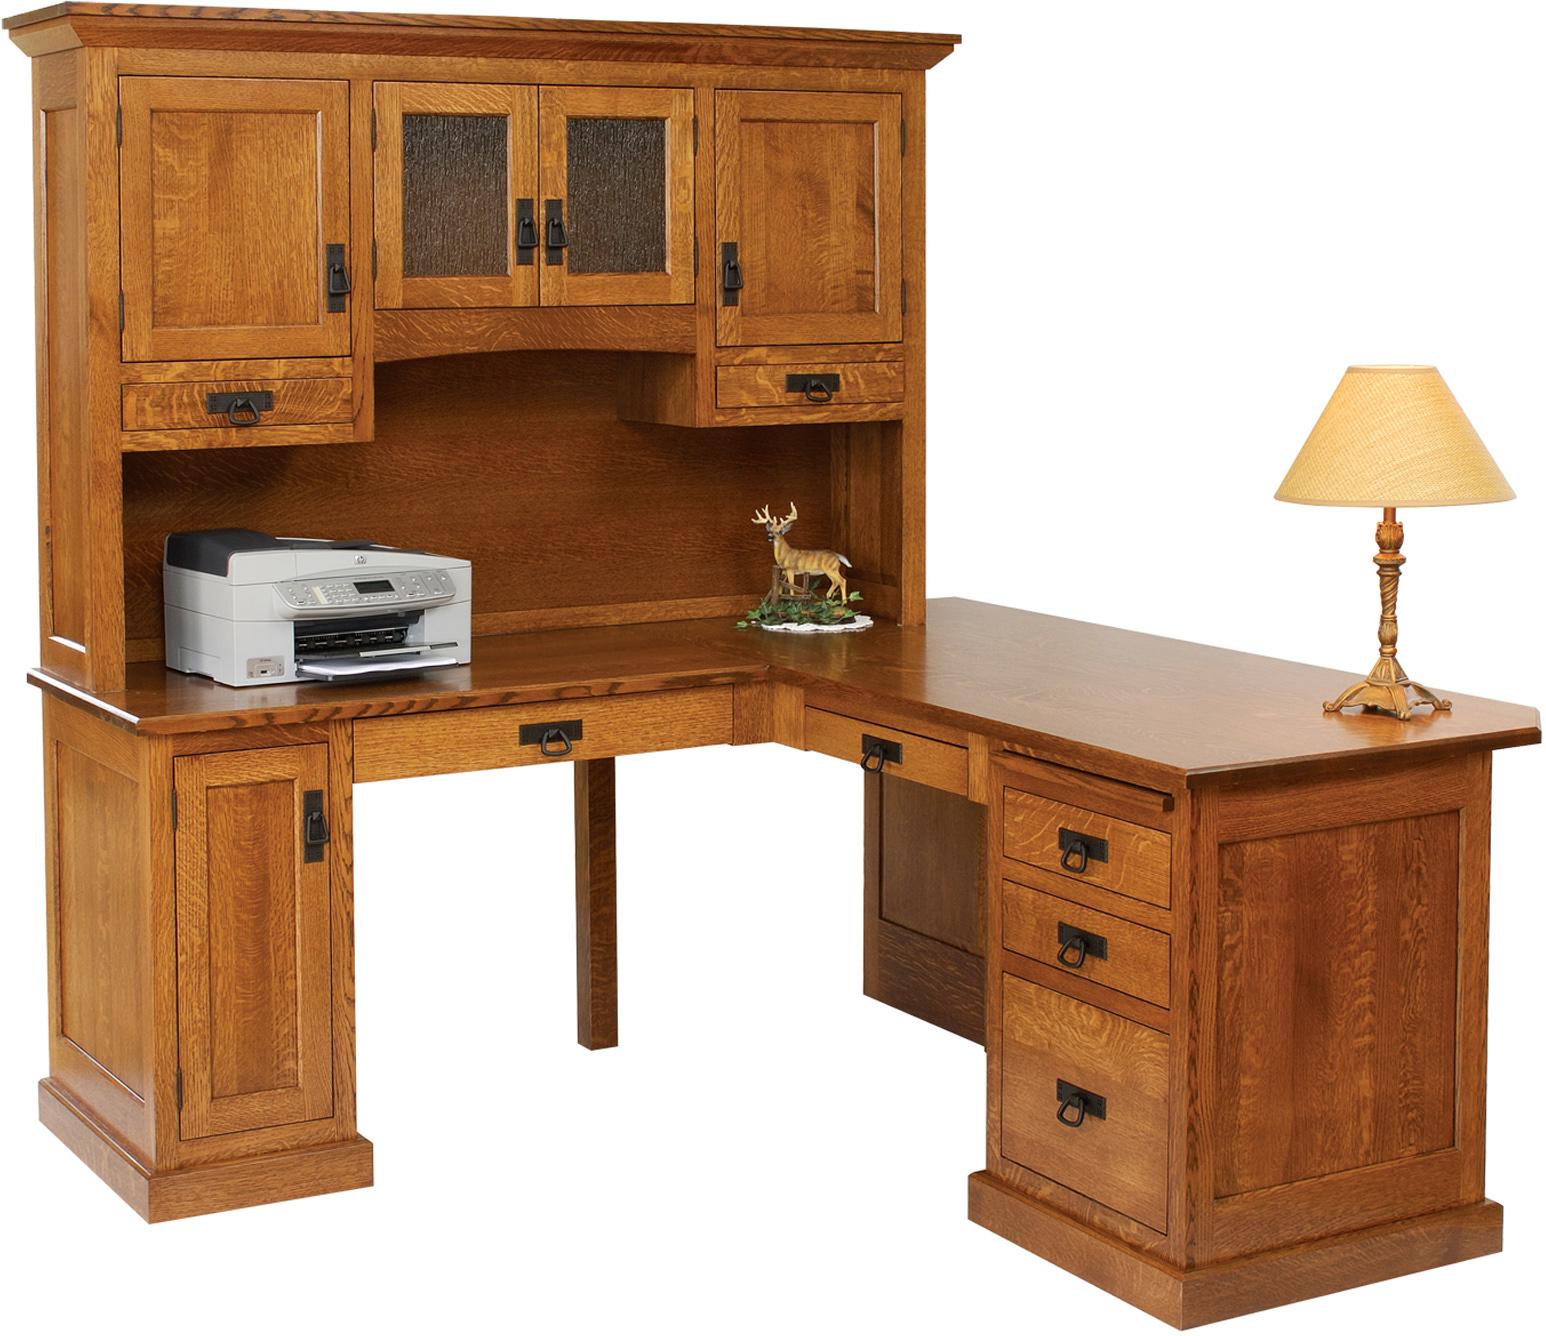 Homestead Corner Desk with Hutch  Amish Homestead Corner Desk